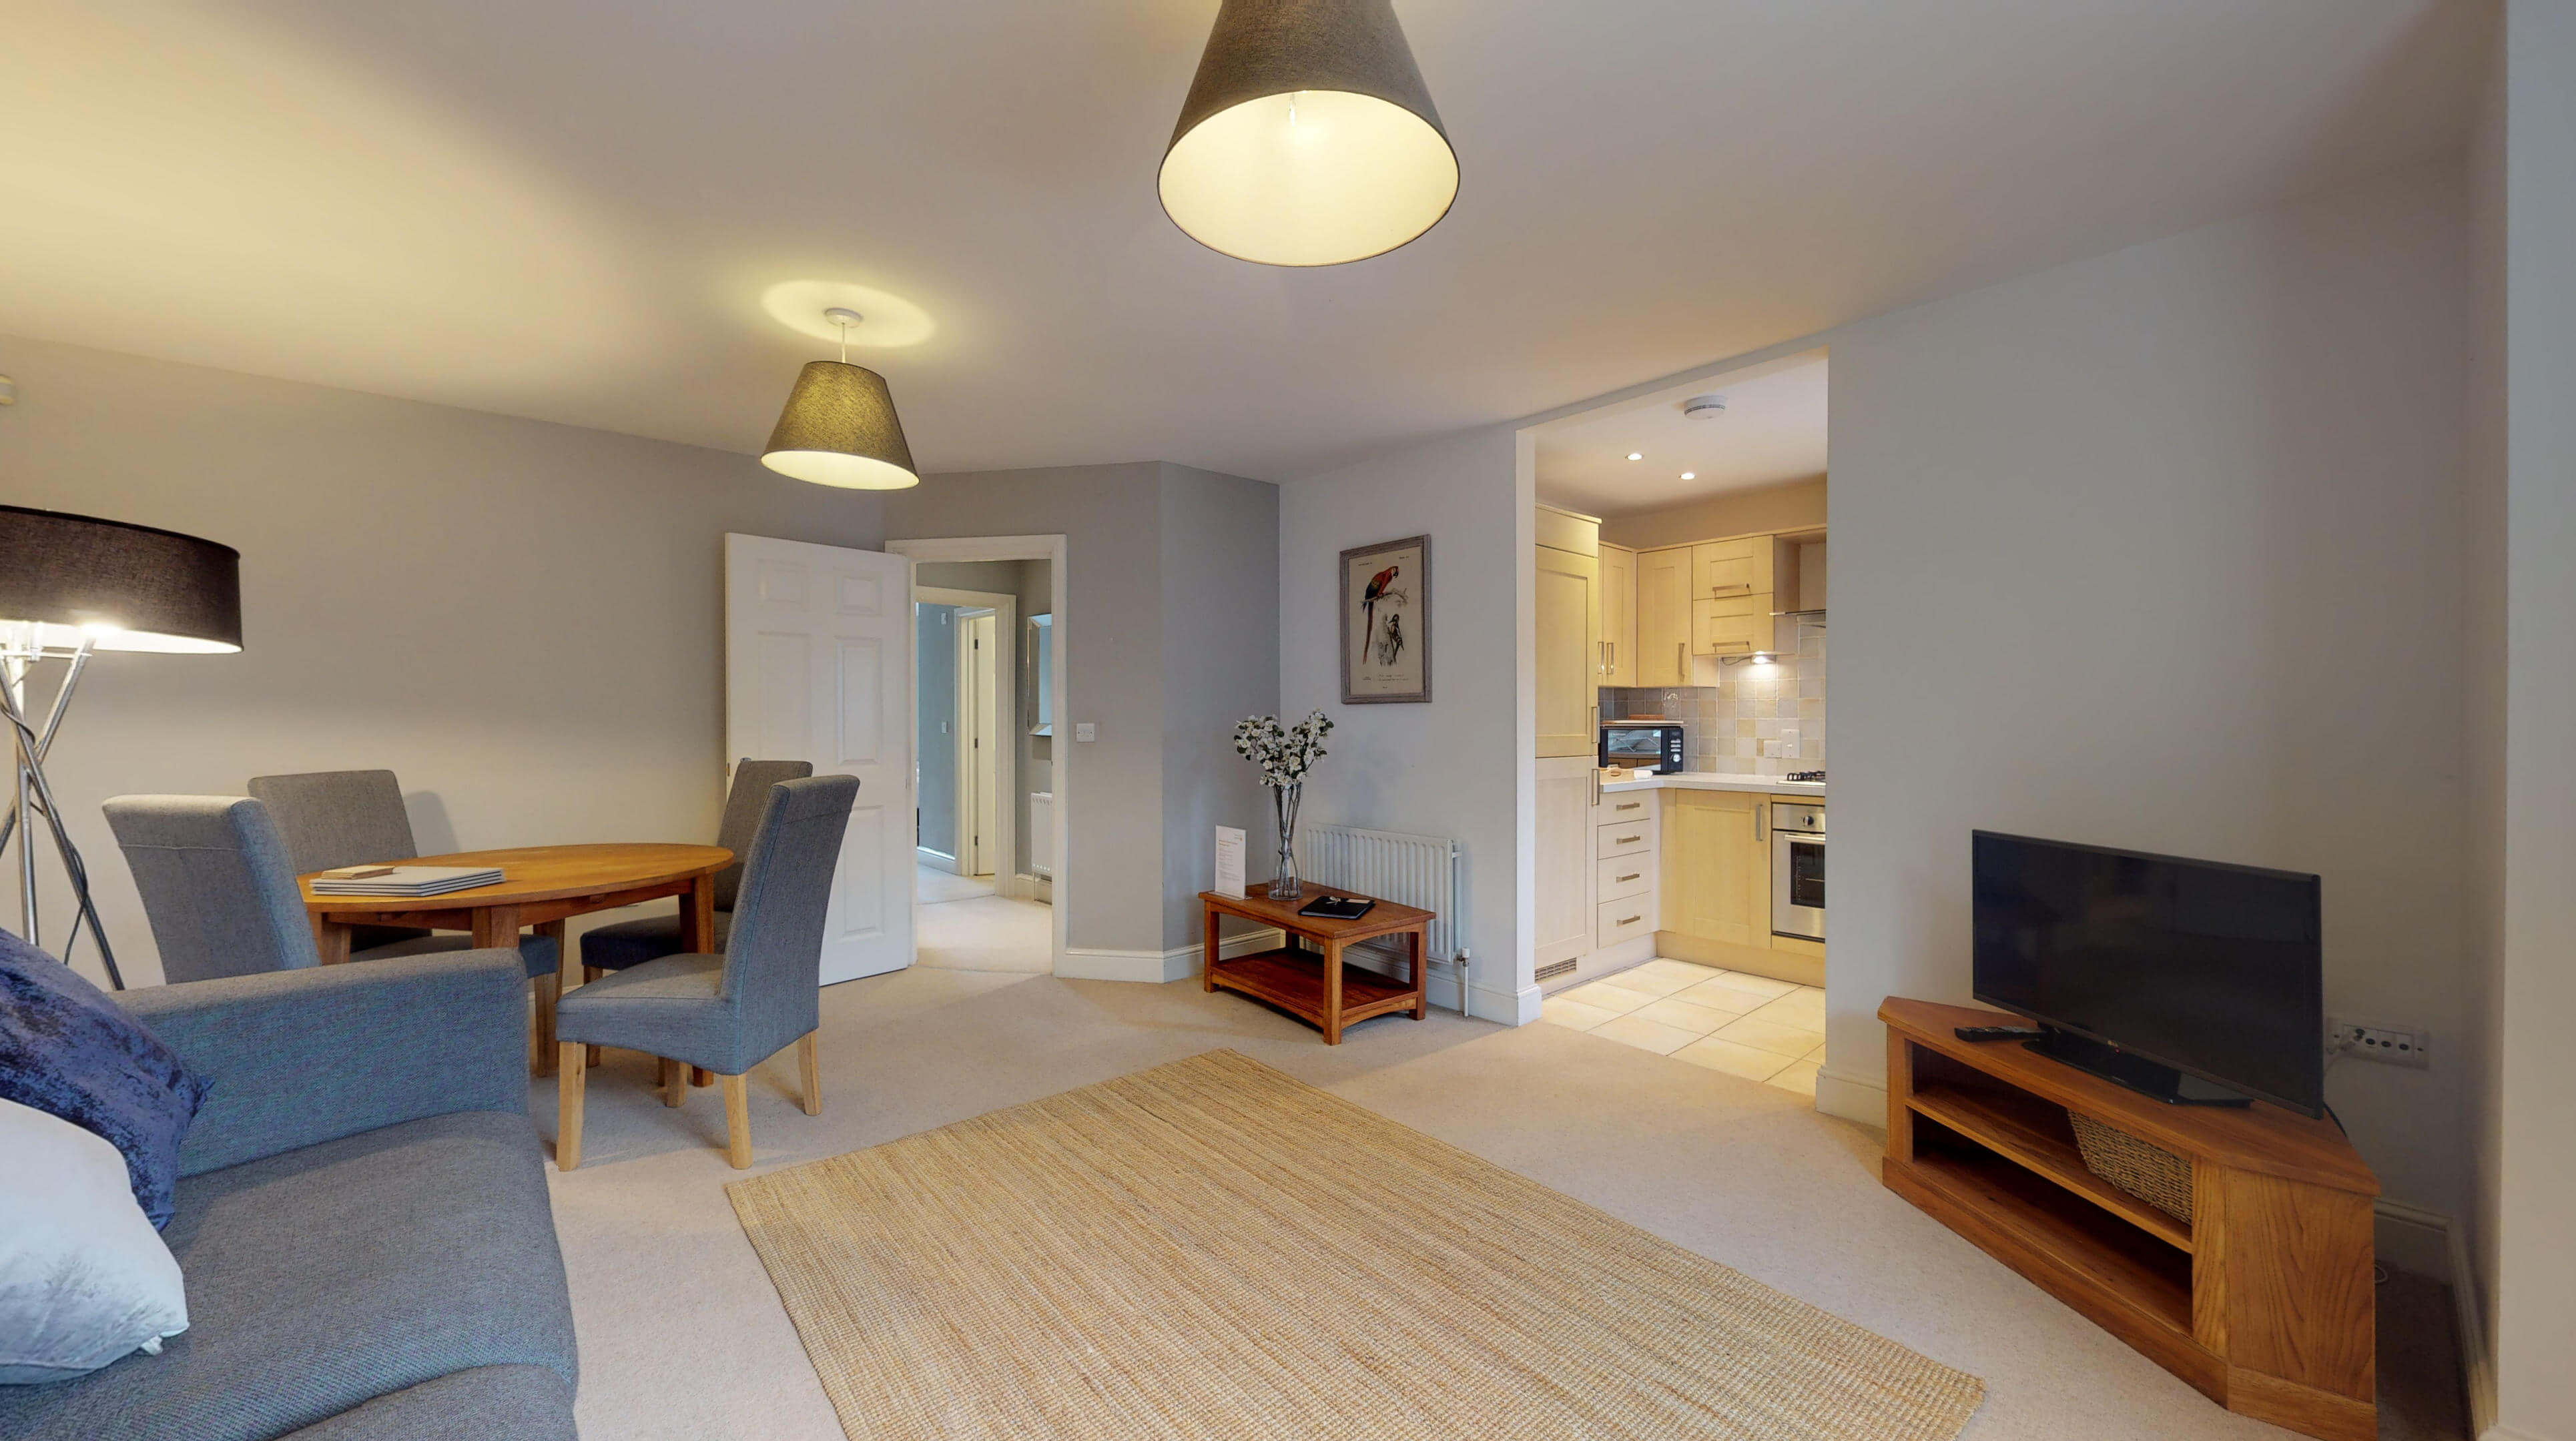 Oxford Serviced Apartments Hensington Suite Livingroom View